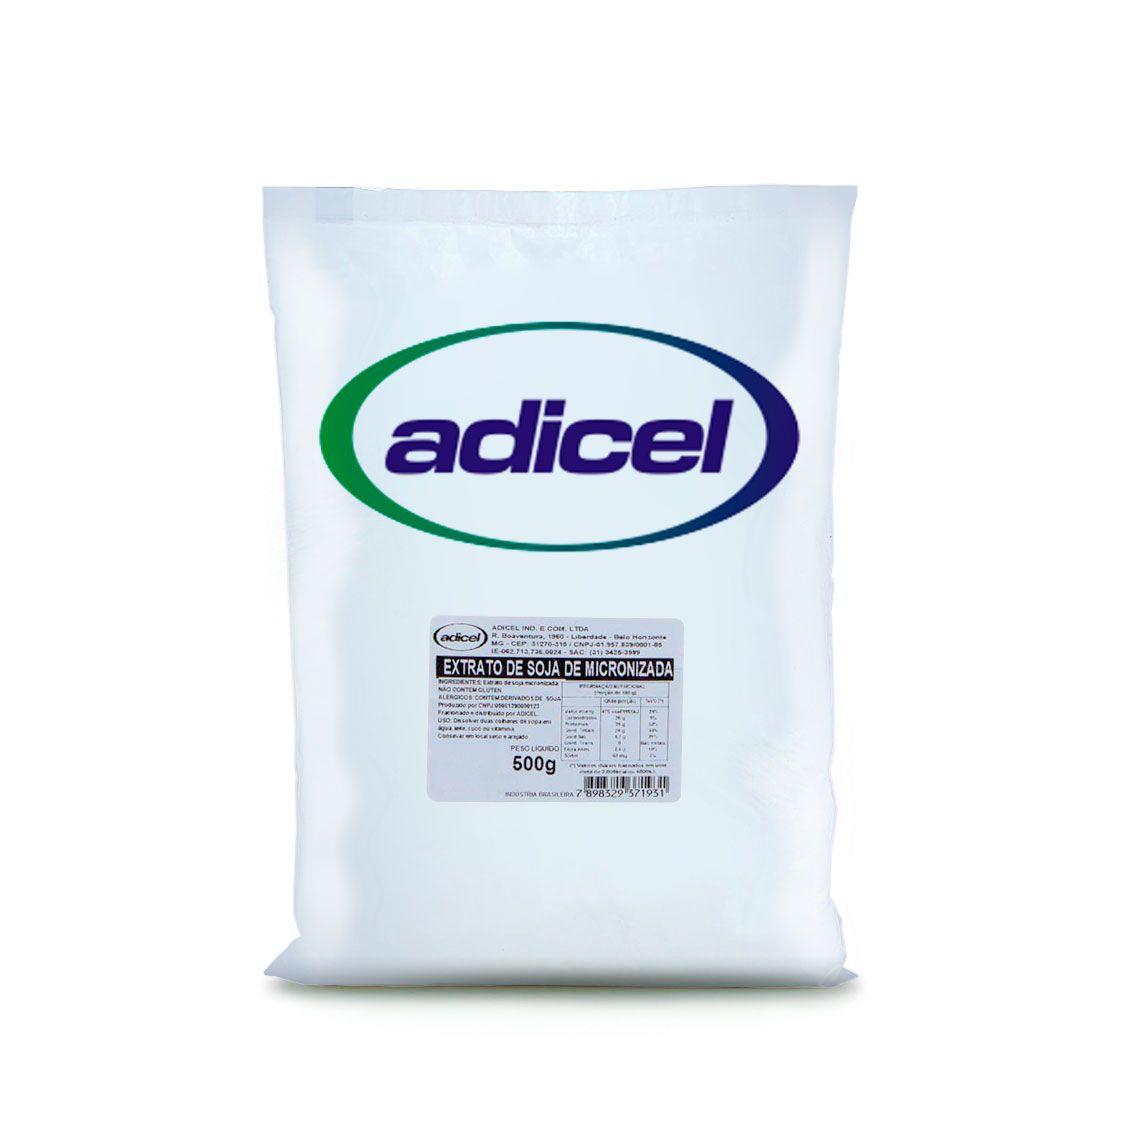 Extrato De Soja Micronizada - 500 g